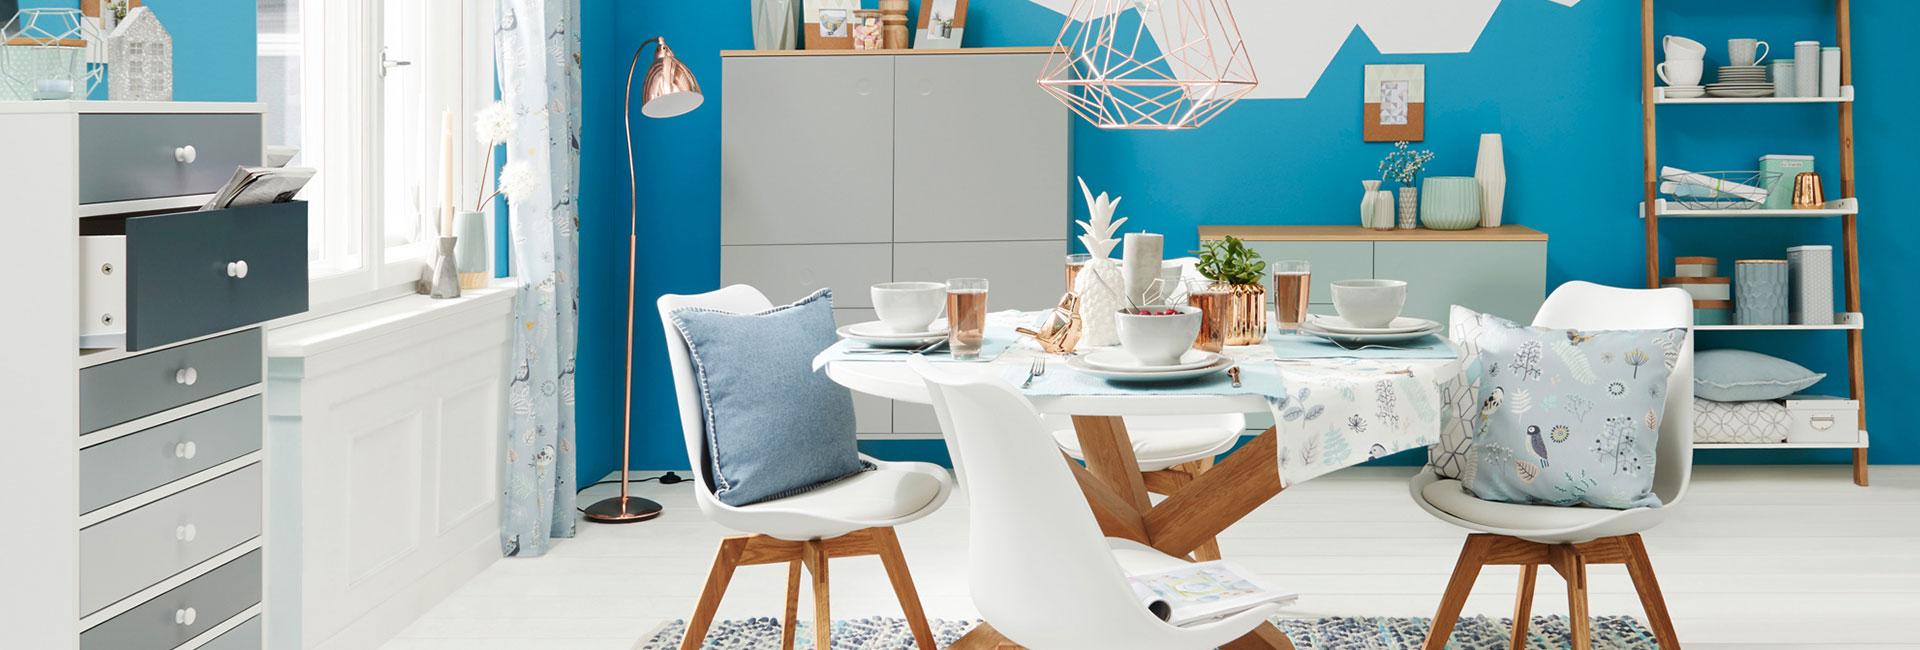 Möbel Höffner Wohnideen